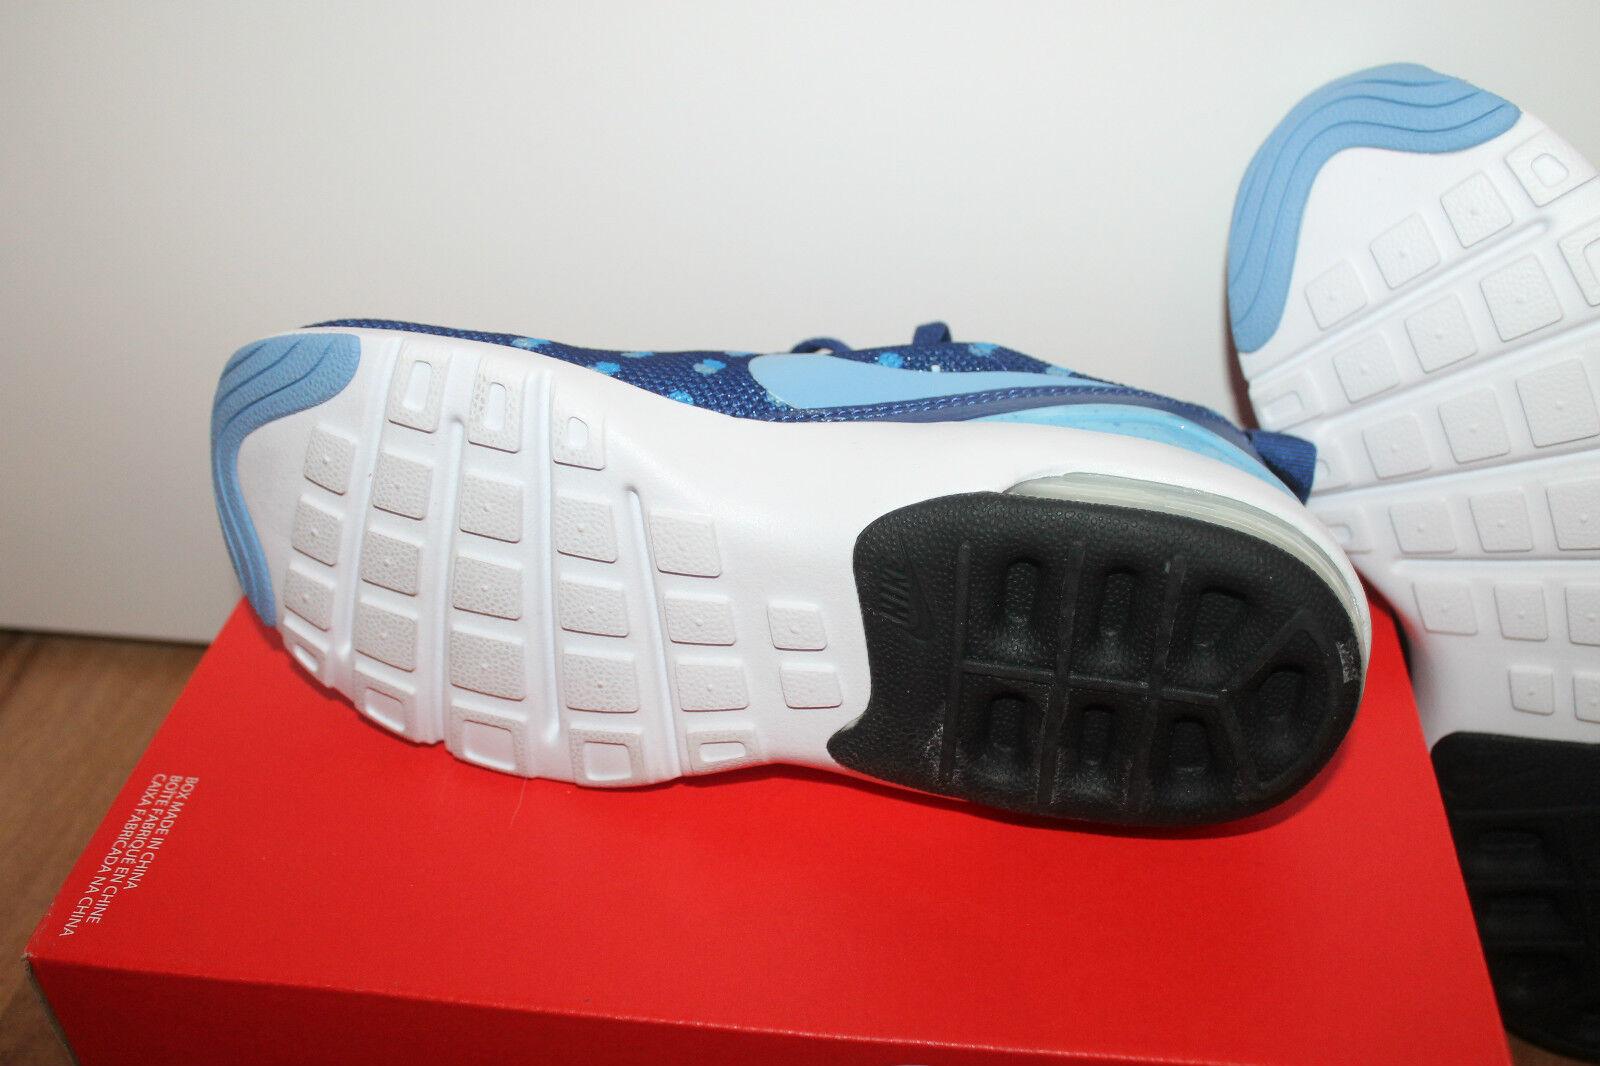 Nike Wmns Air Max Sirena Mujer Zapatilla Azul Blanco Tamaño Tamaño Tamaño 37,5 Nuevo con Caja 369ec3